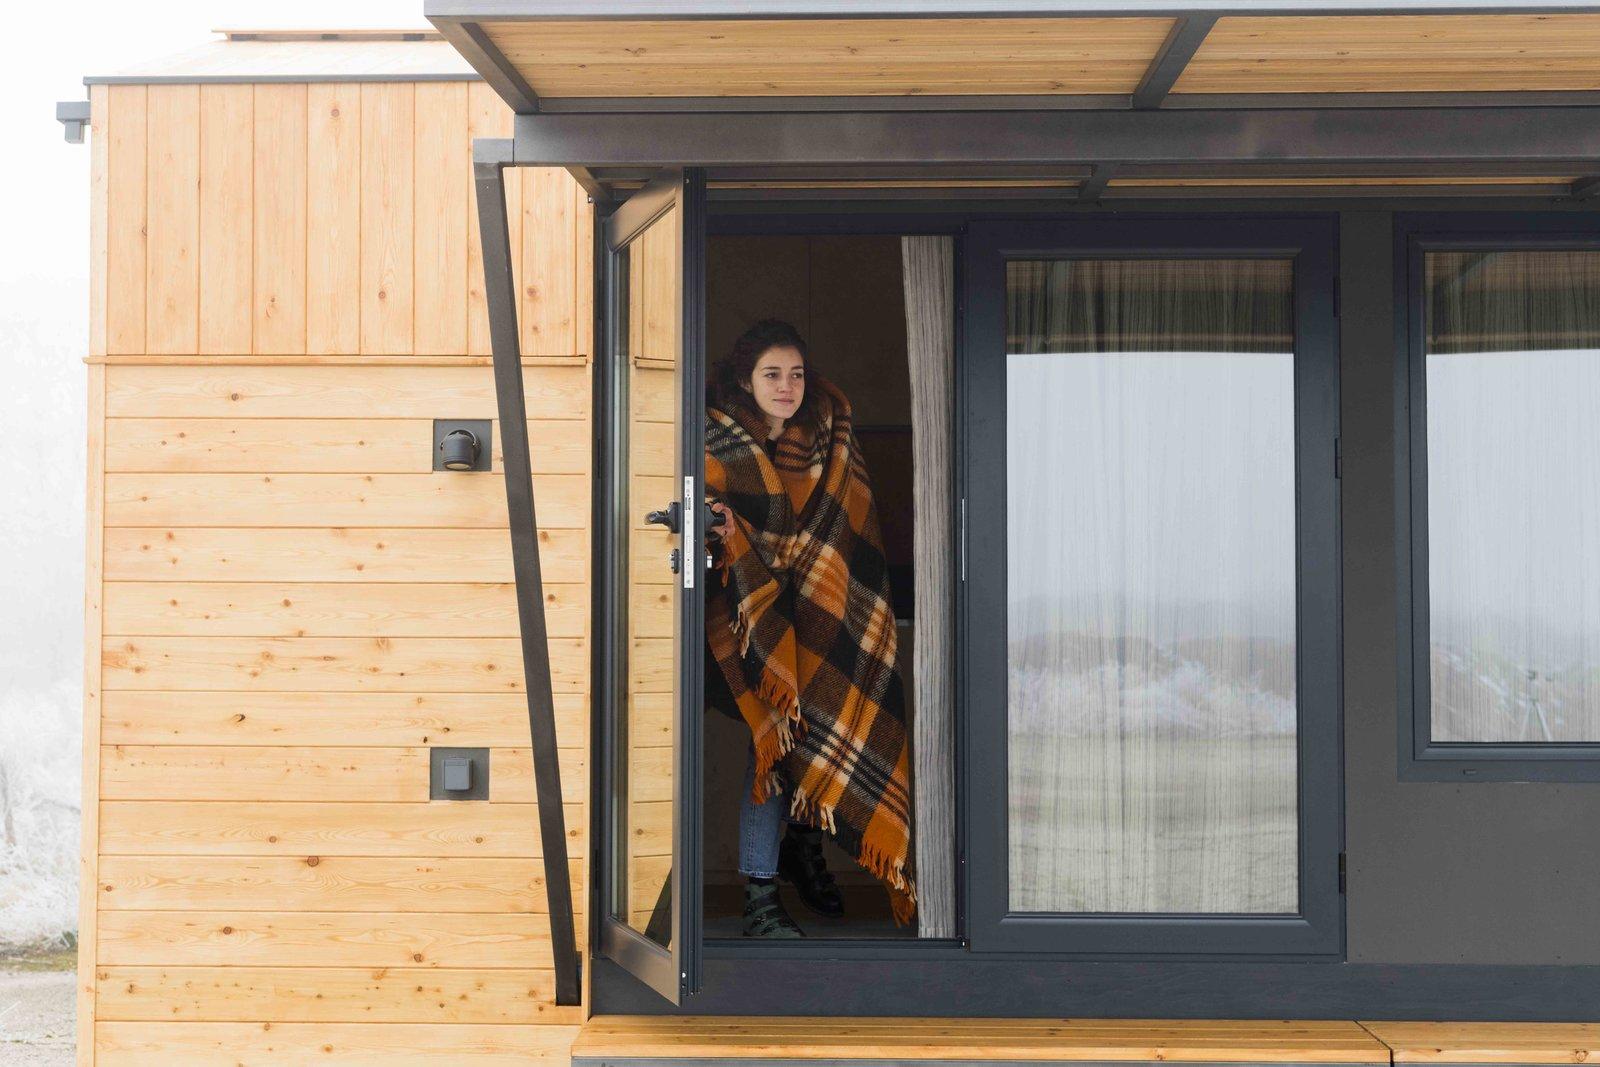 Exterior, Wood Siding Material, and Tiny Home Building Type Feel welcome  KOLELIBA Family Tiny House